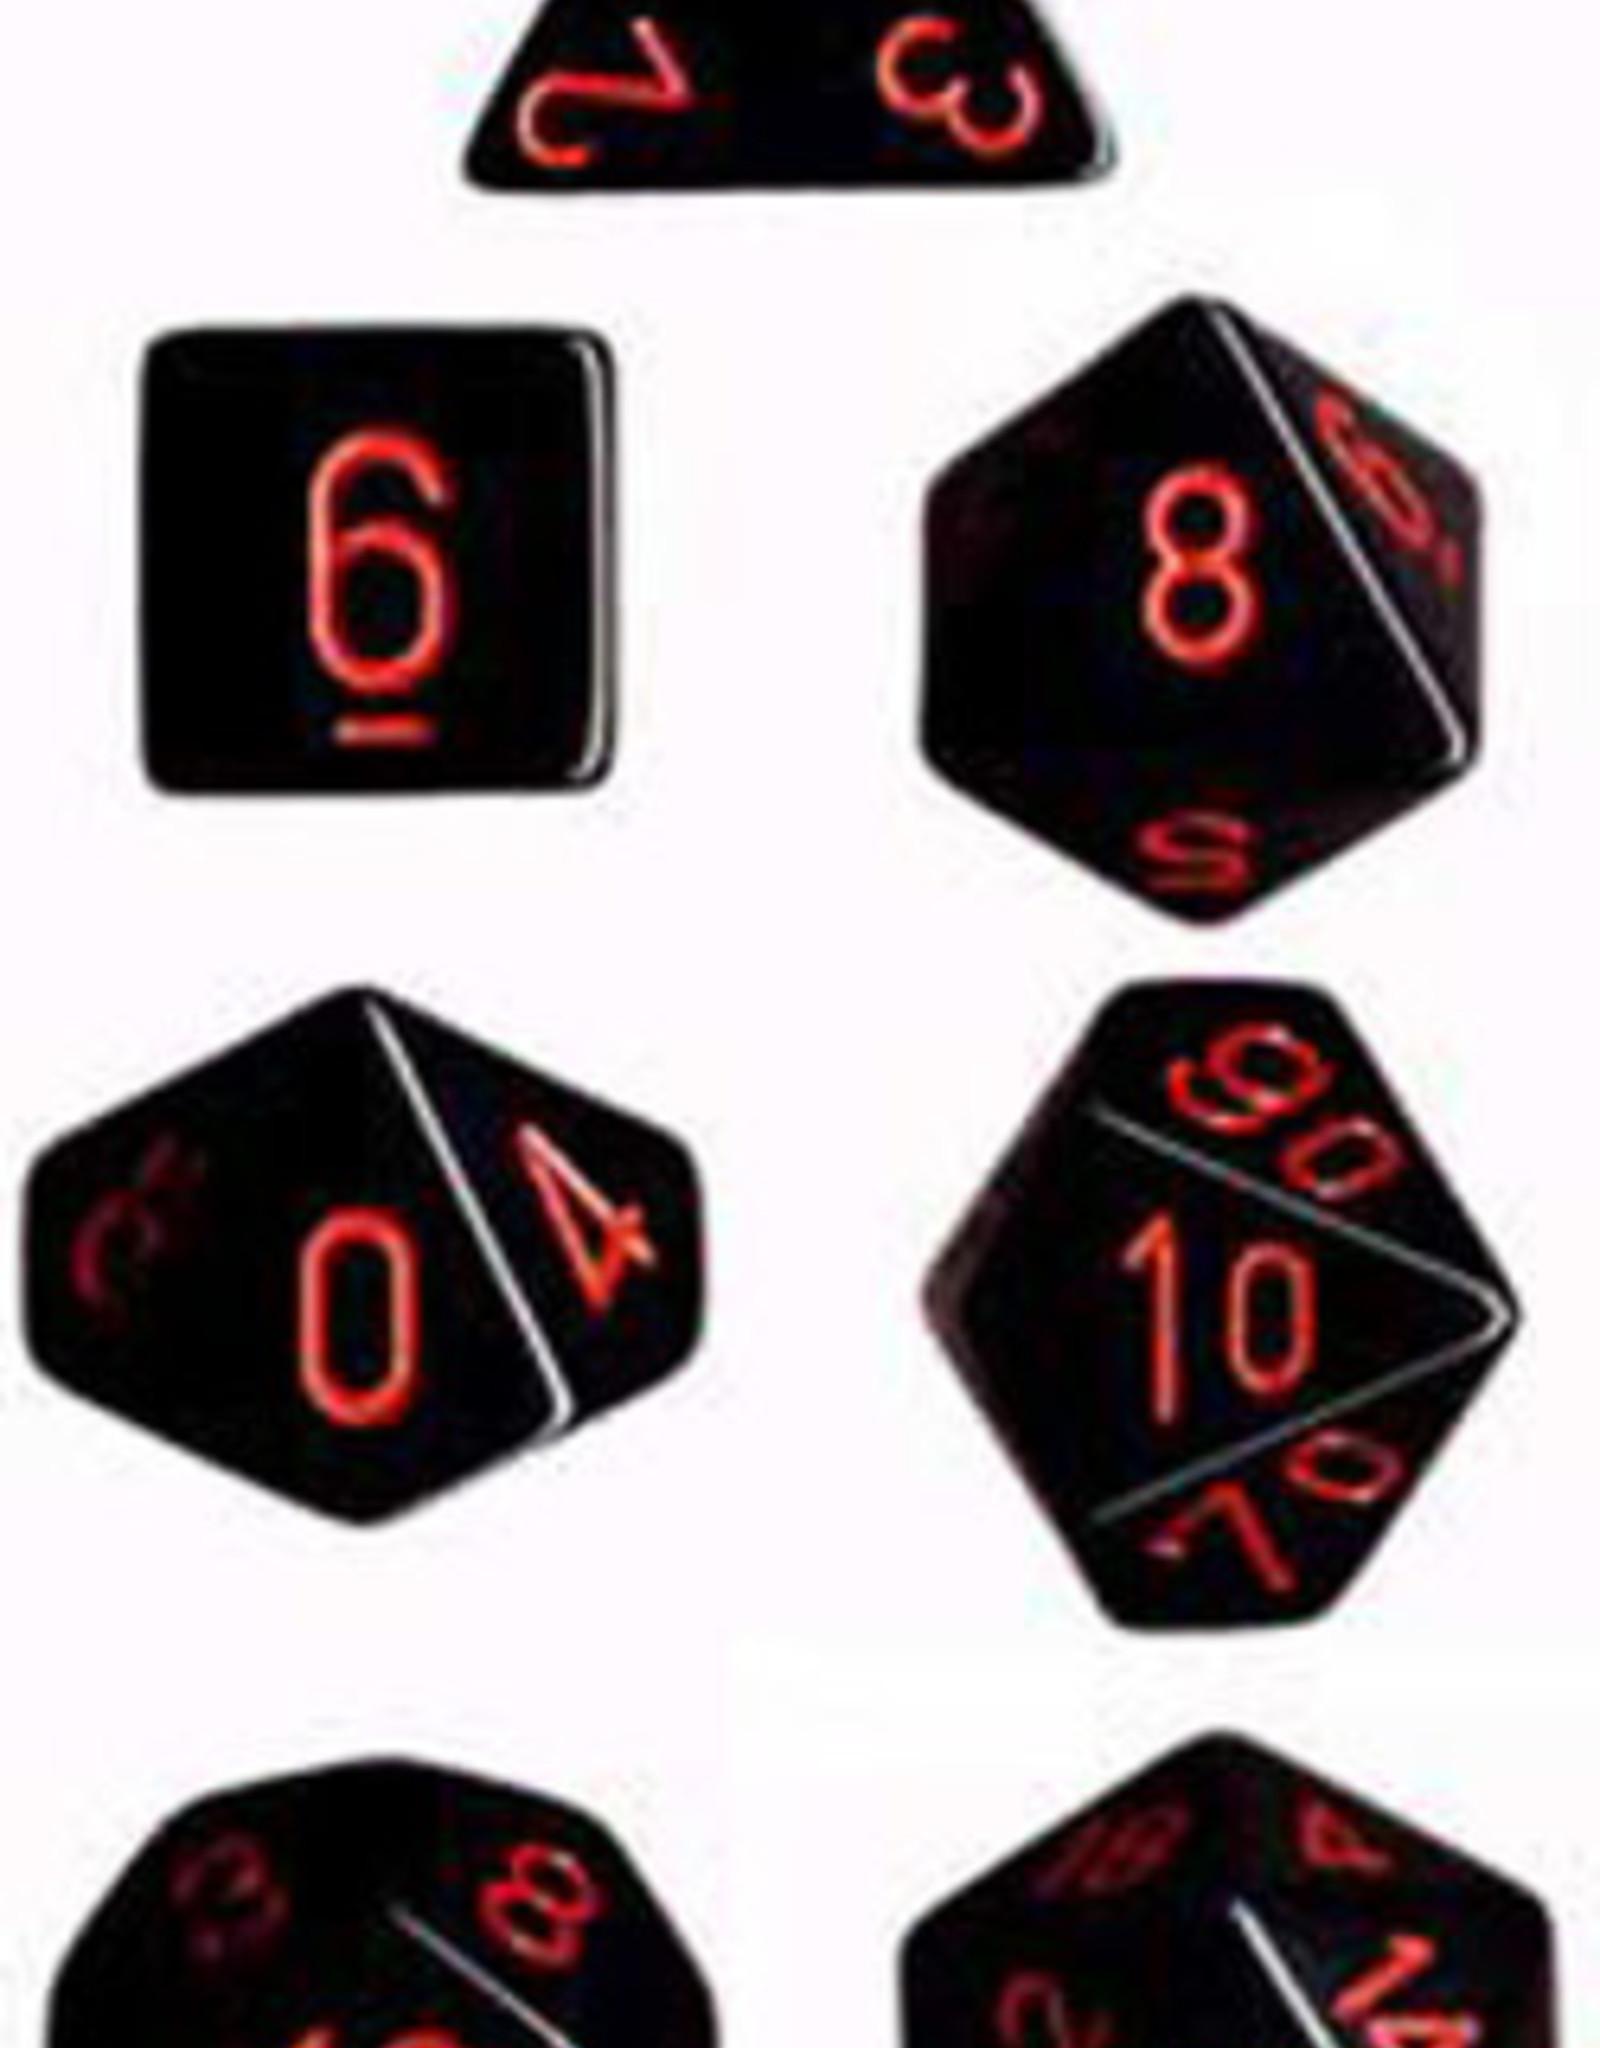 Chessex Dice Block 7ct. - Red/Black